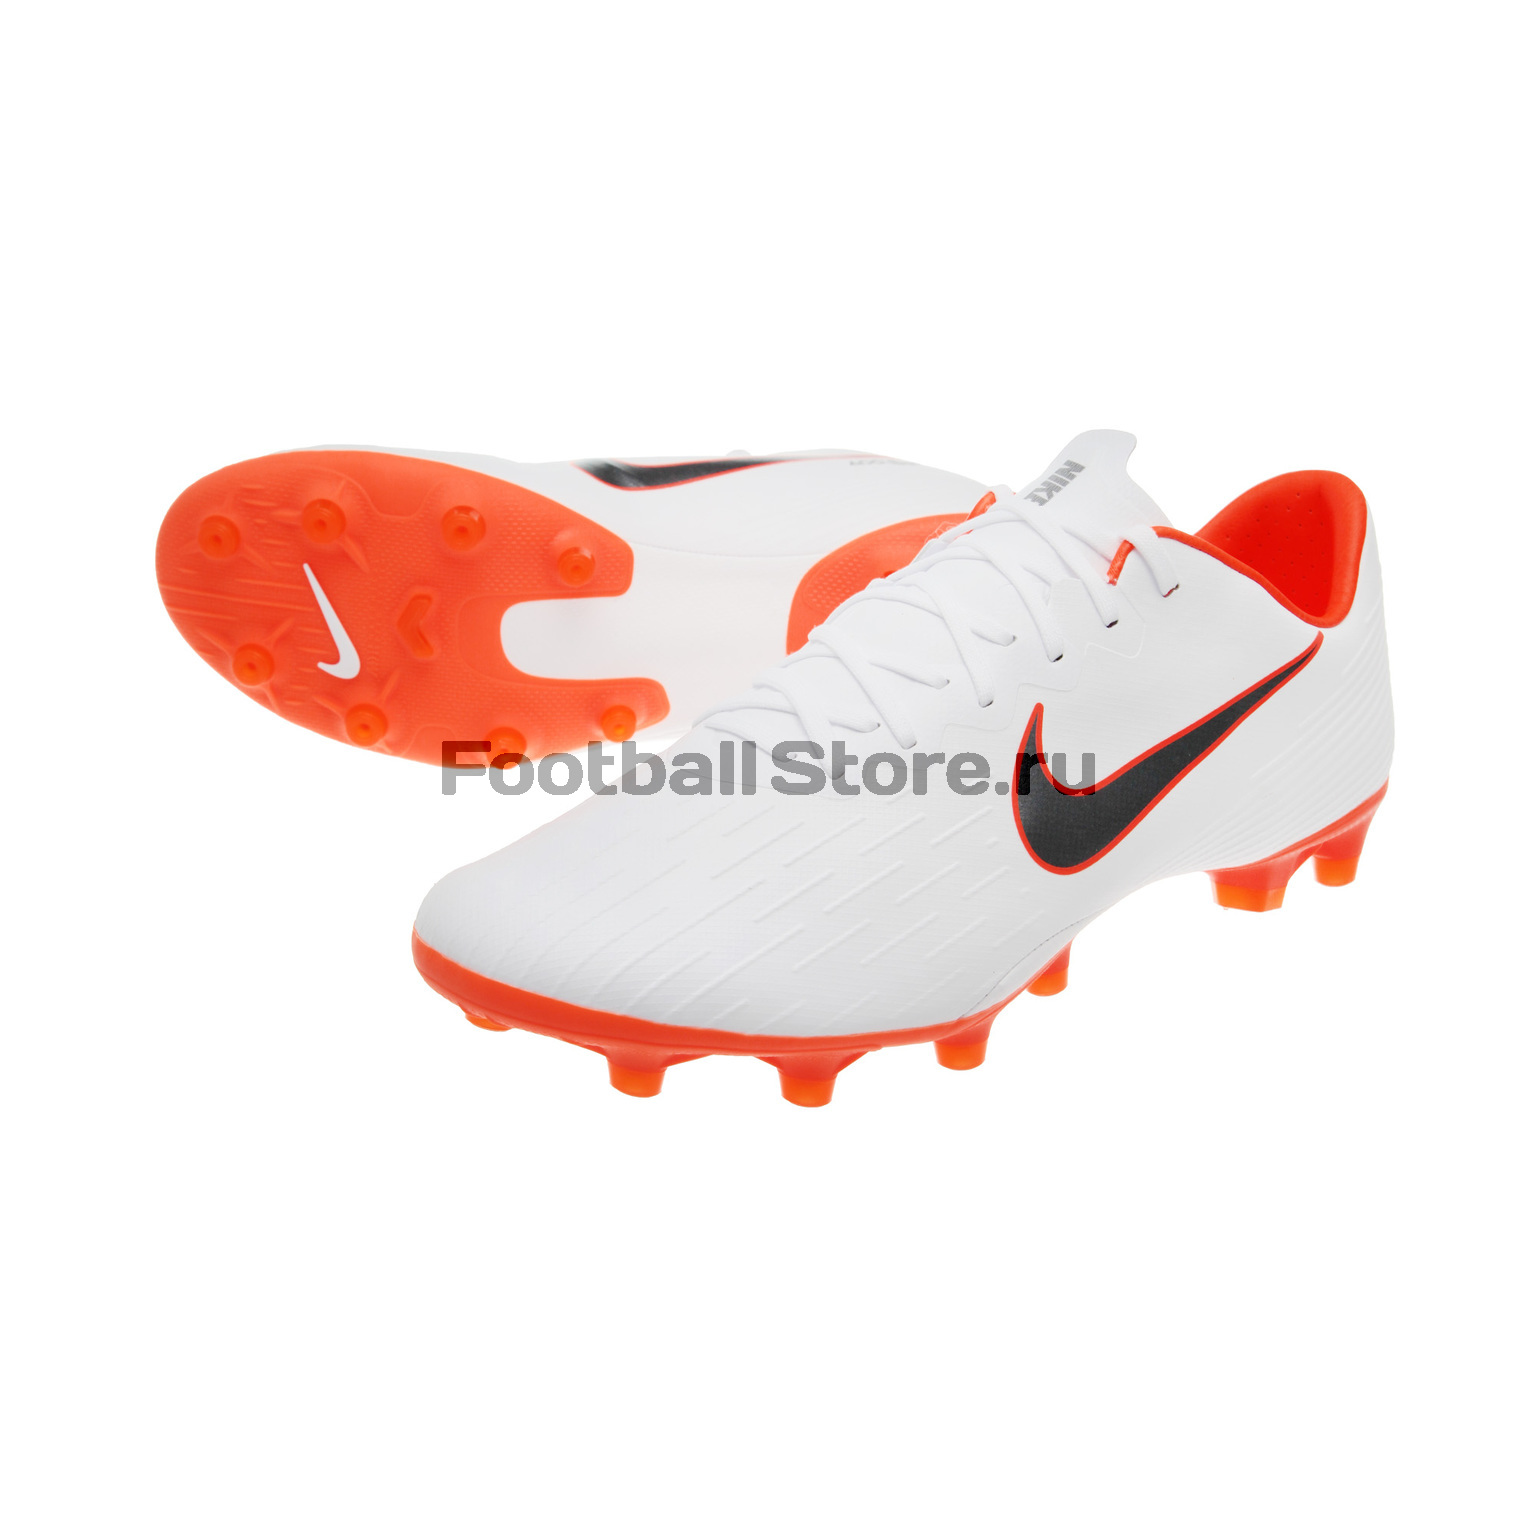 Бутсы Nike Mercurial Vapor 12 Pro AG-Pro AH8759-107 бутсы nike 10 mercurial victory ag 651617 800